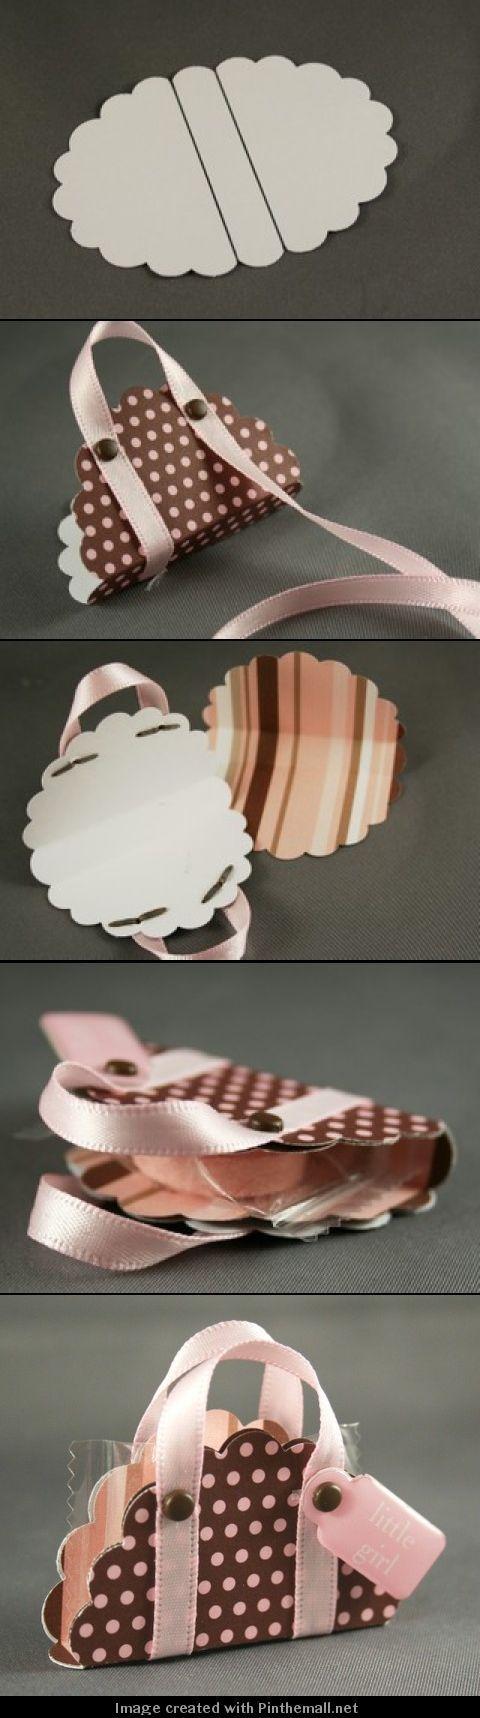 An itty-bitty purse! #DIY